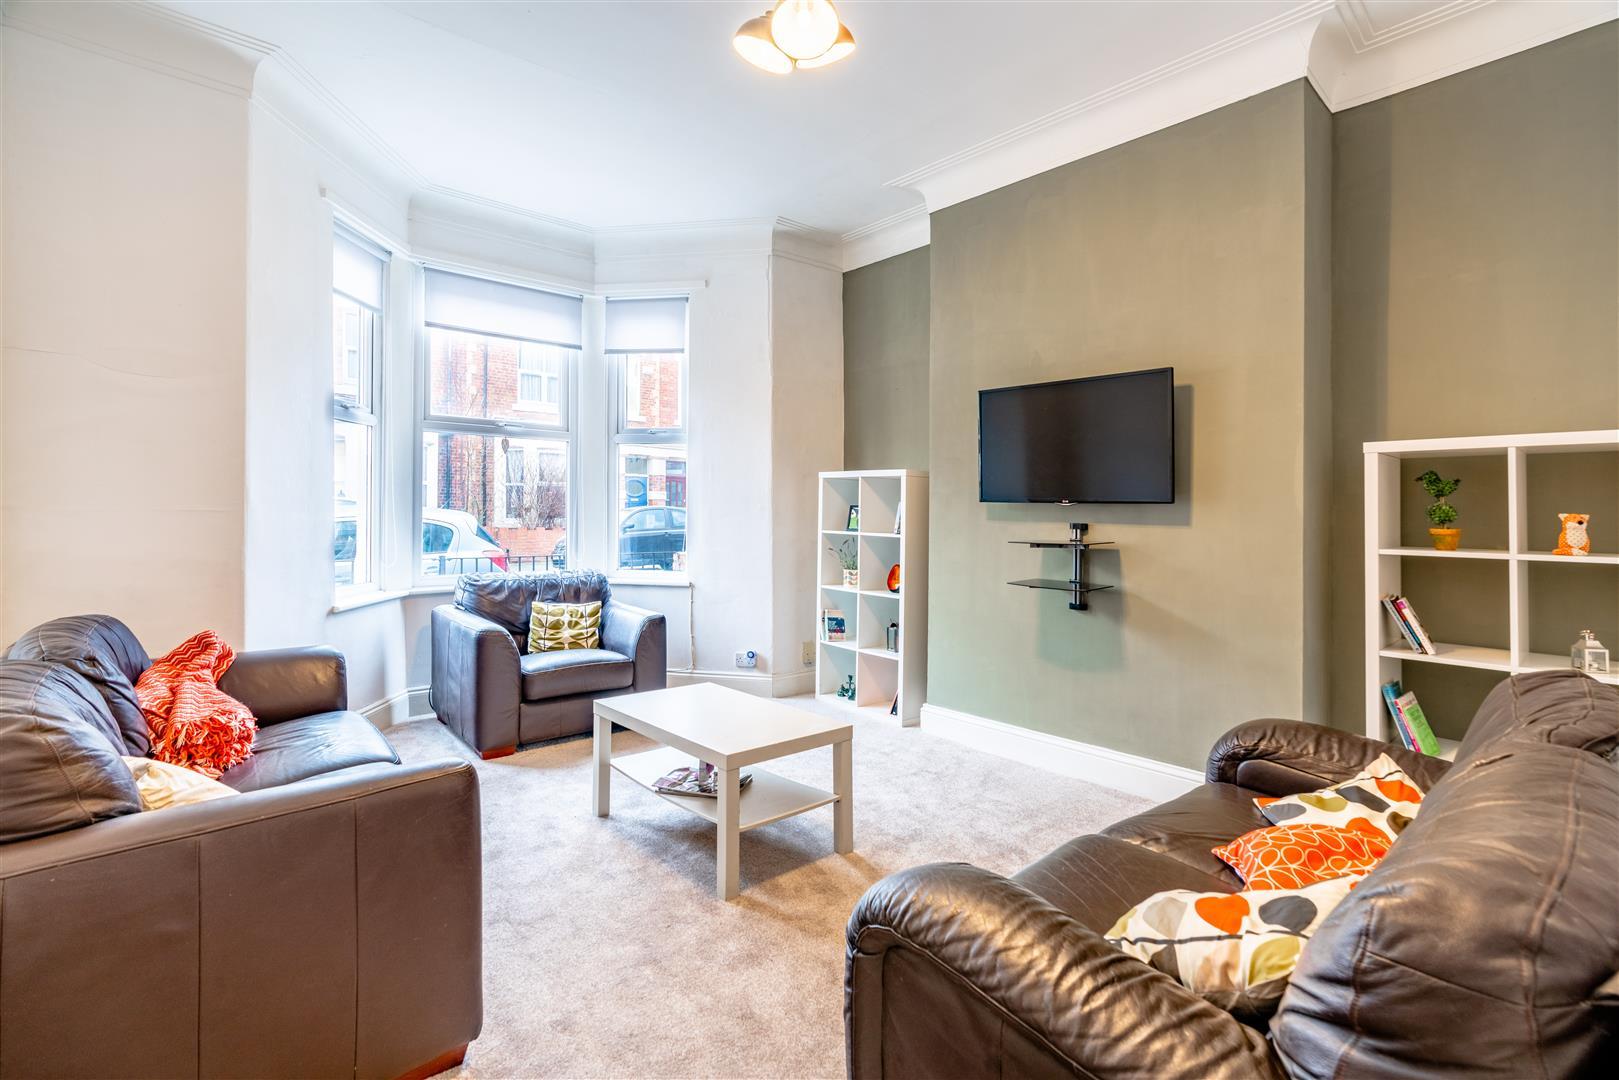 7 bed terraced house to rent in Cheltenham Terrace, Heaton, NE6